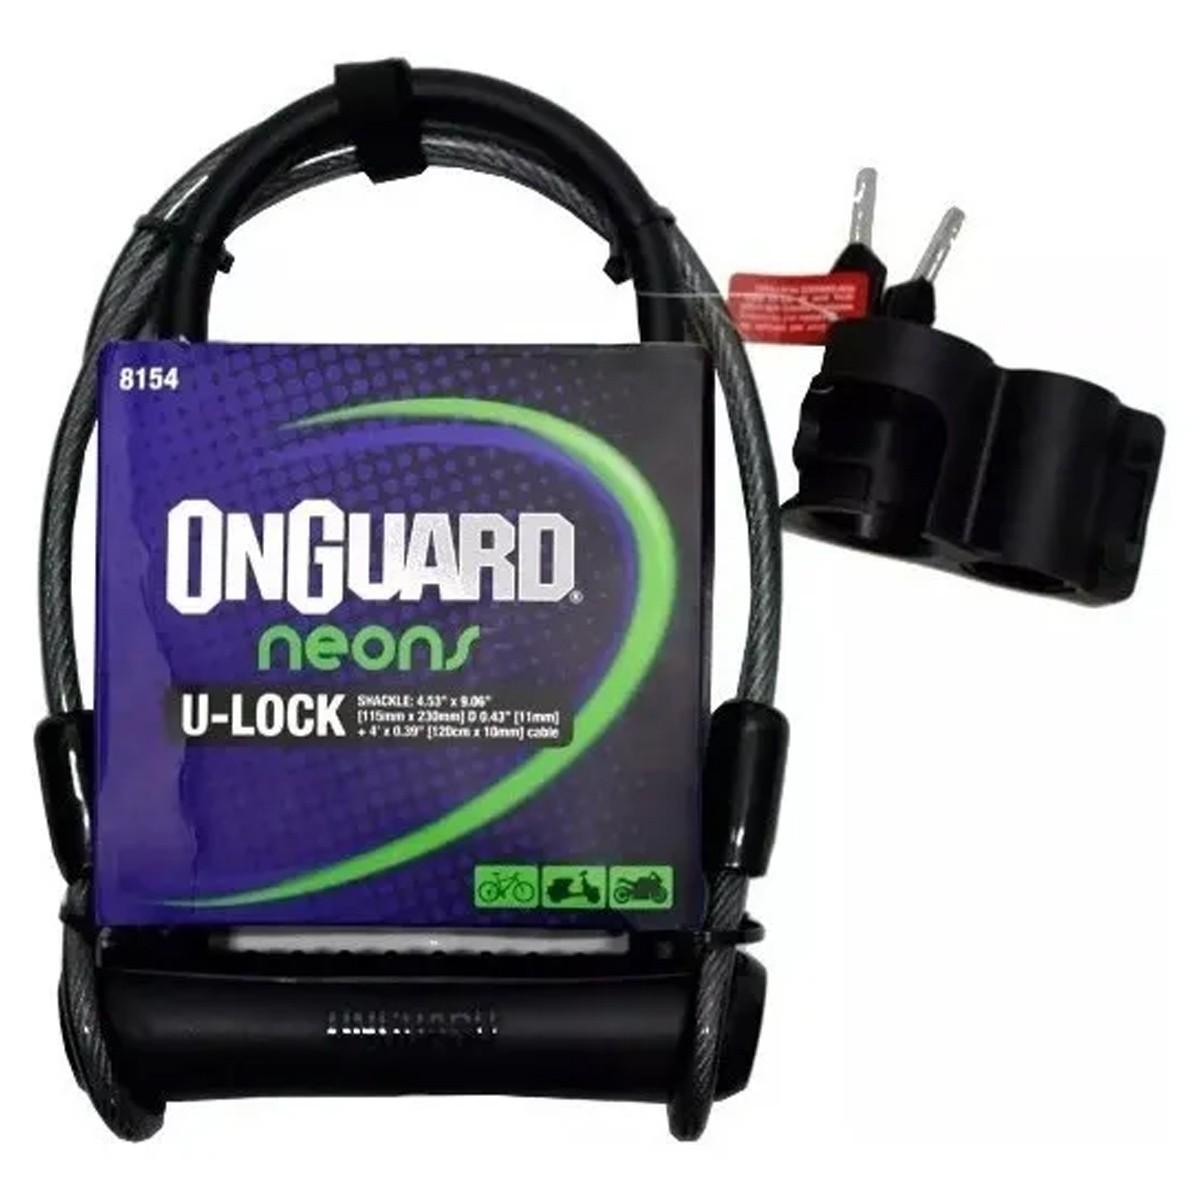 Cadeado Onguard Neon 8154 U-Lock